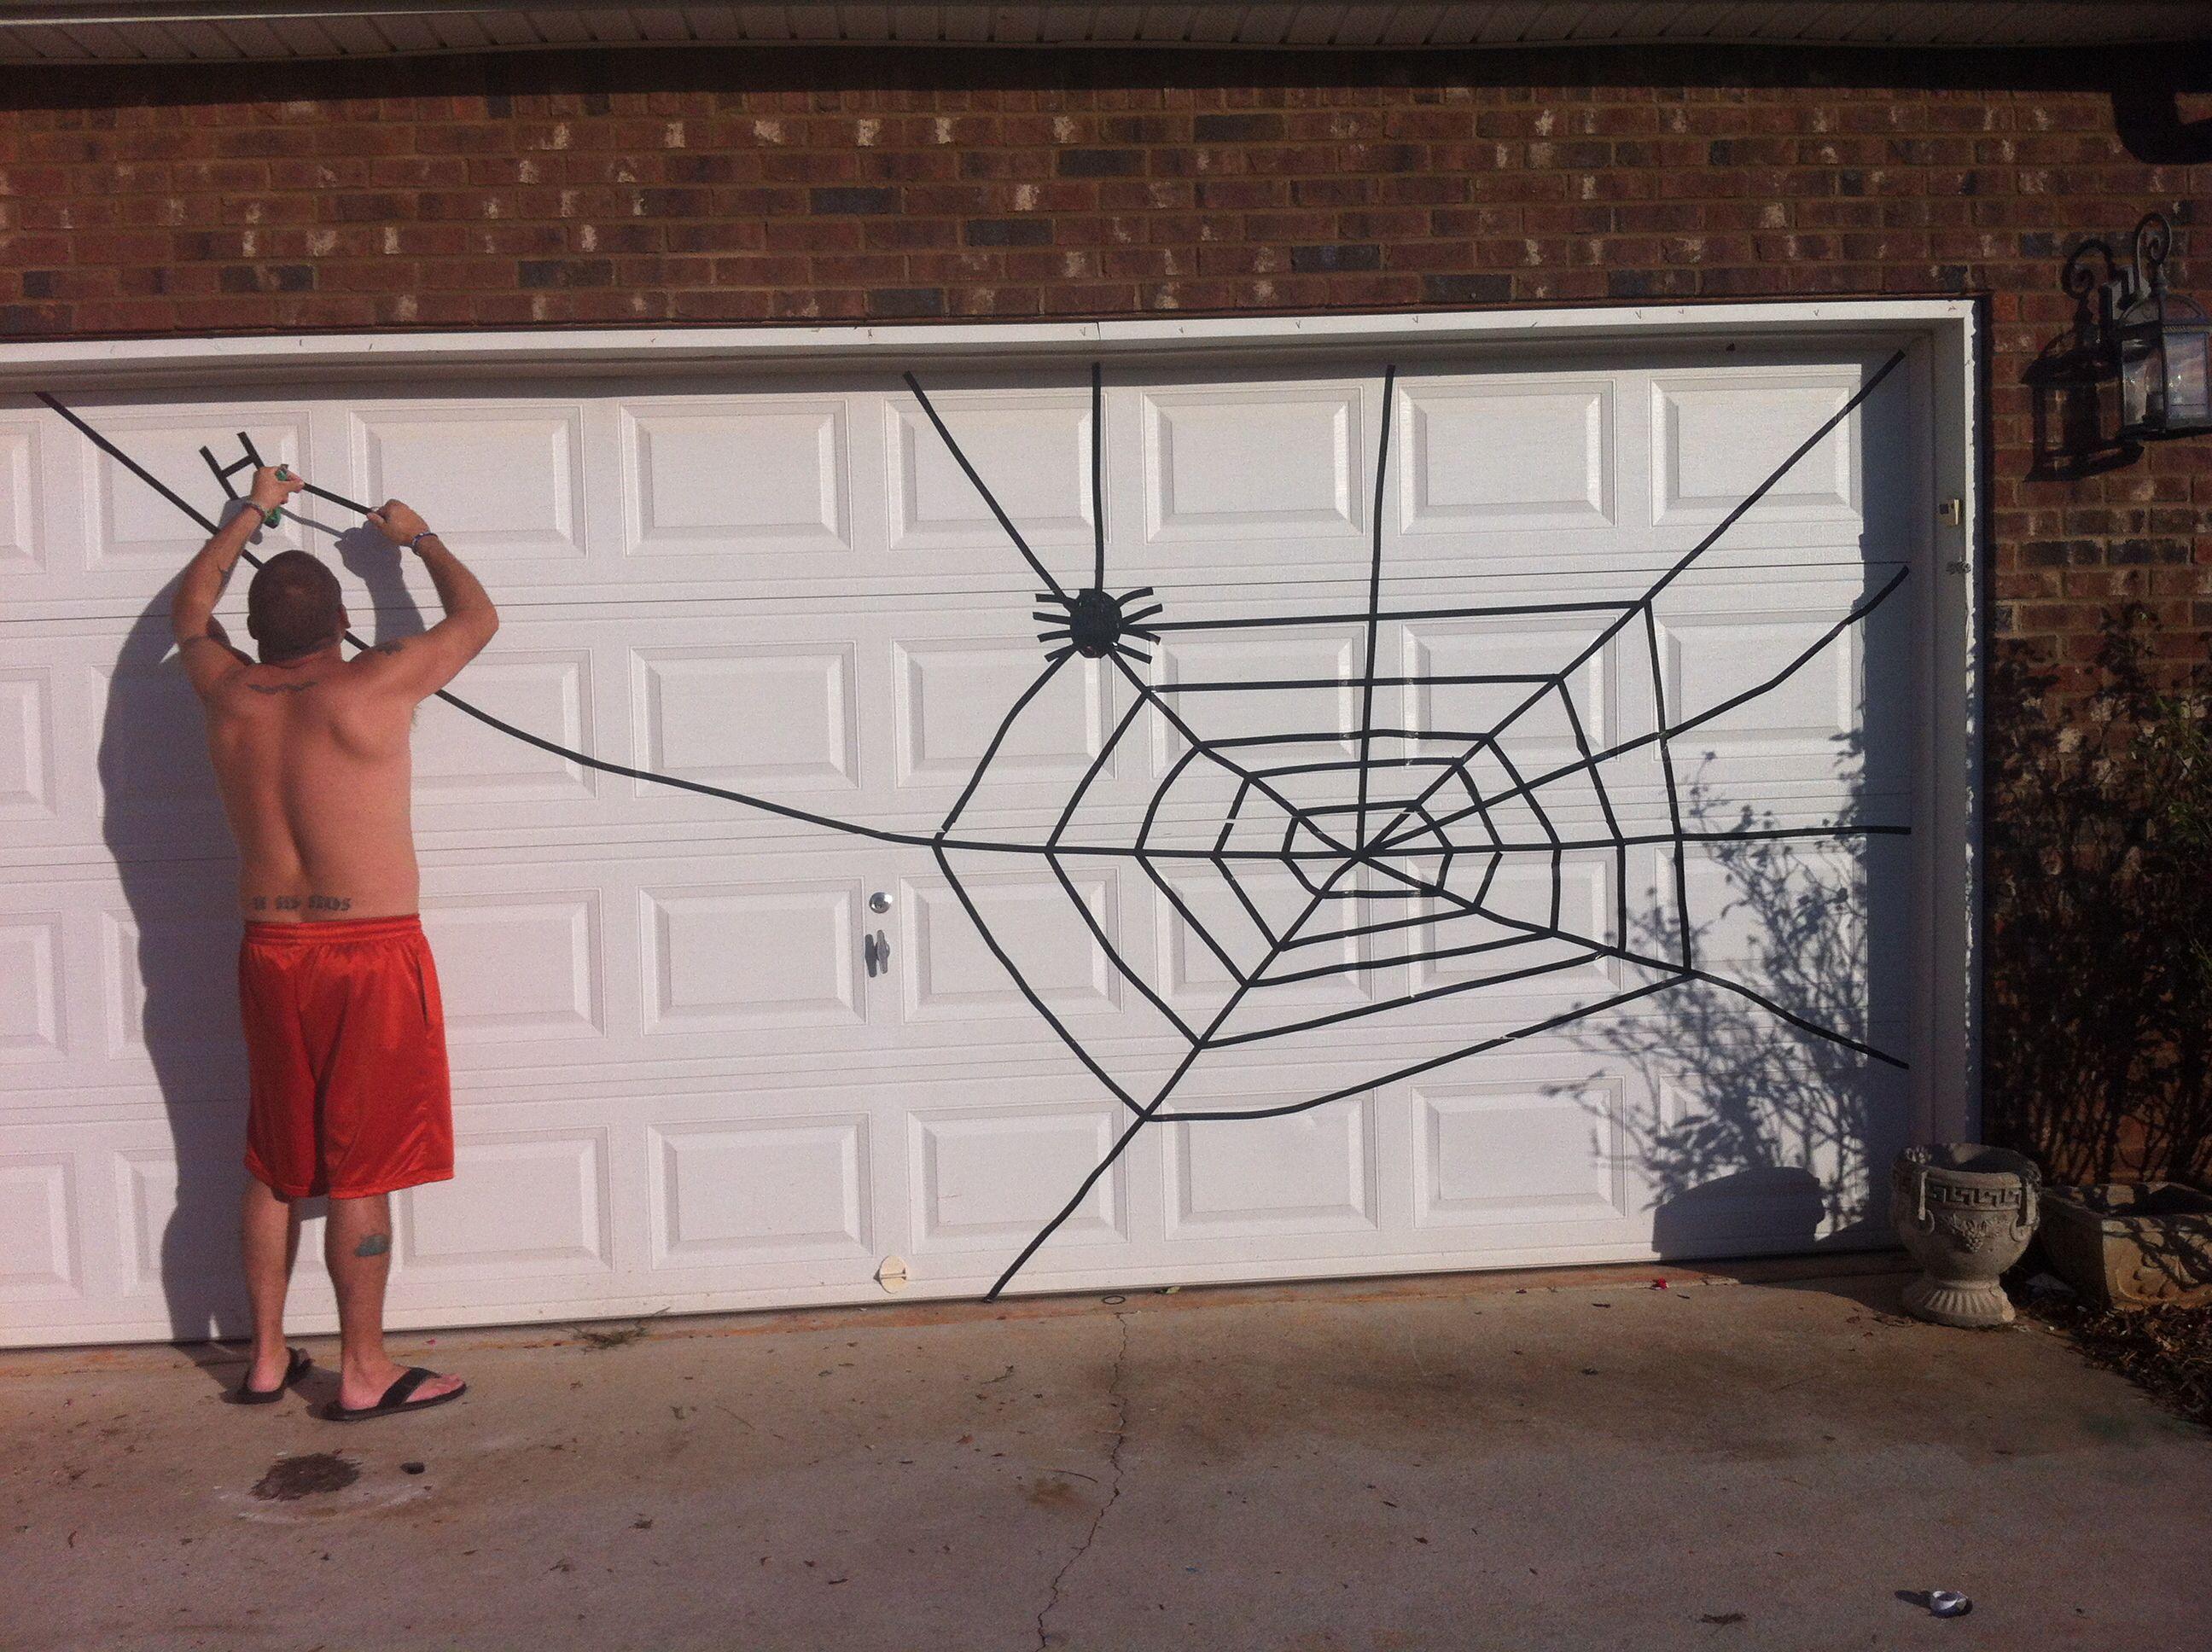 Spider Web For Halloween Garage Door Use Electrical Tape Halloween Door Decorations Halloween Garage Halloween Porch